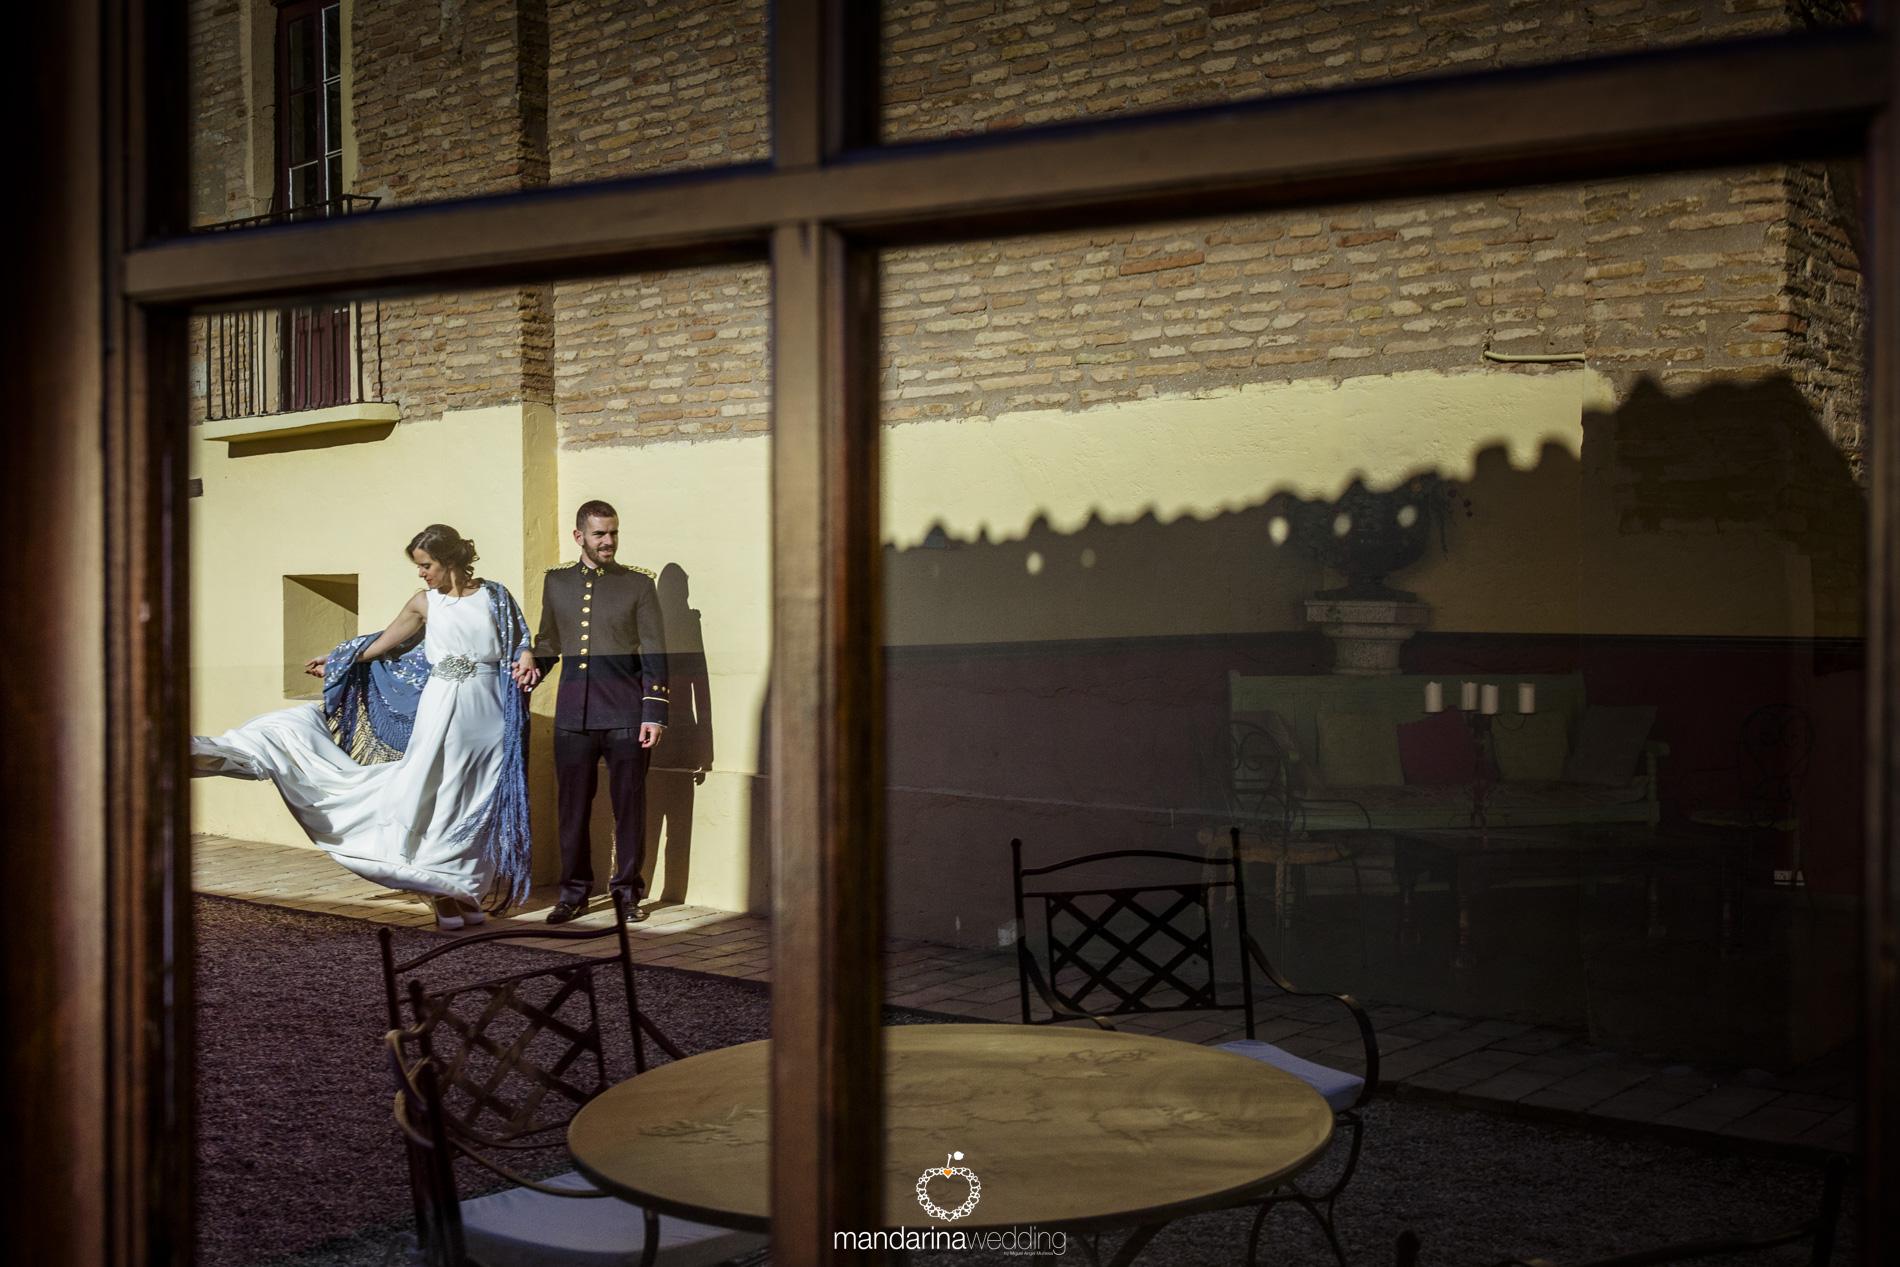 mandarina wedding, fotografos de boda, fotografo boda soria, fotografo boda barcelona, fotografo boda Madrid, fotógrafo boda lerida_16